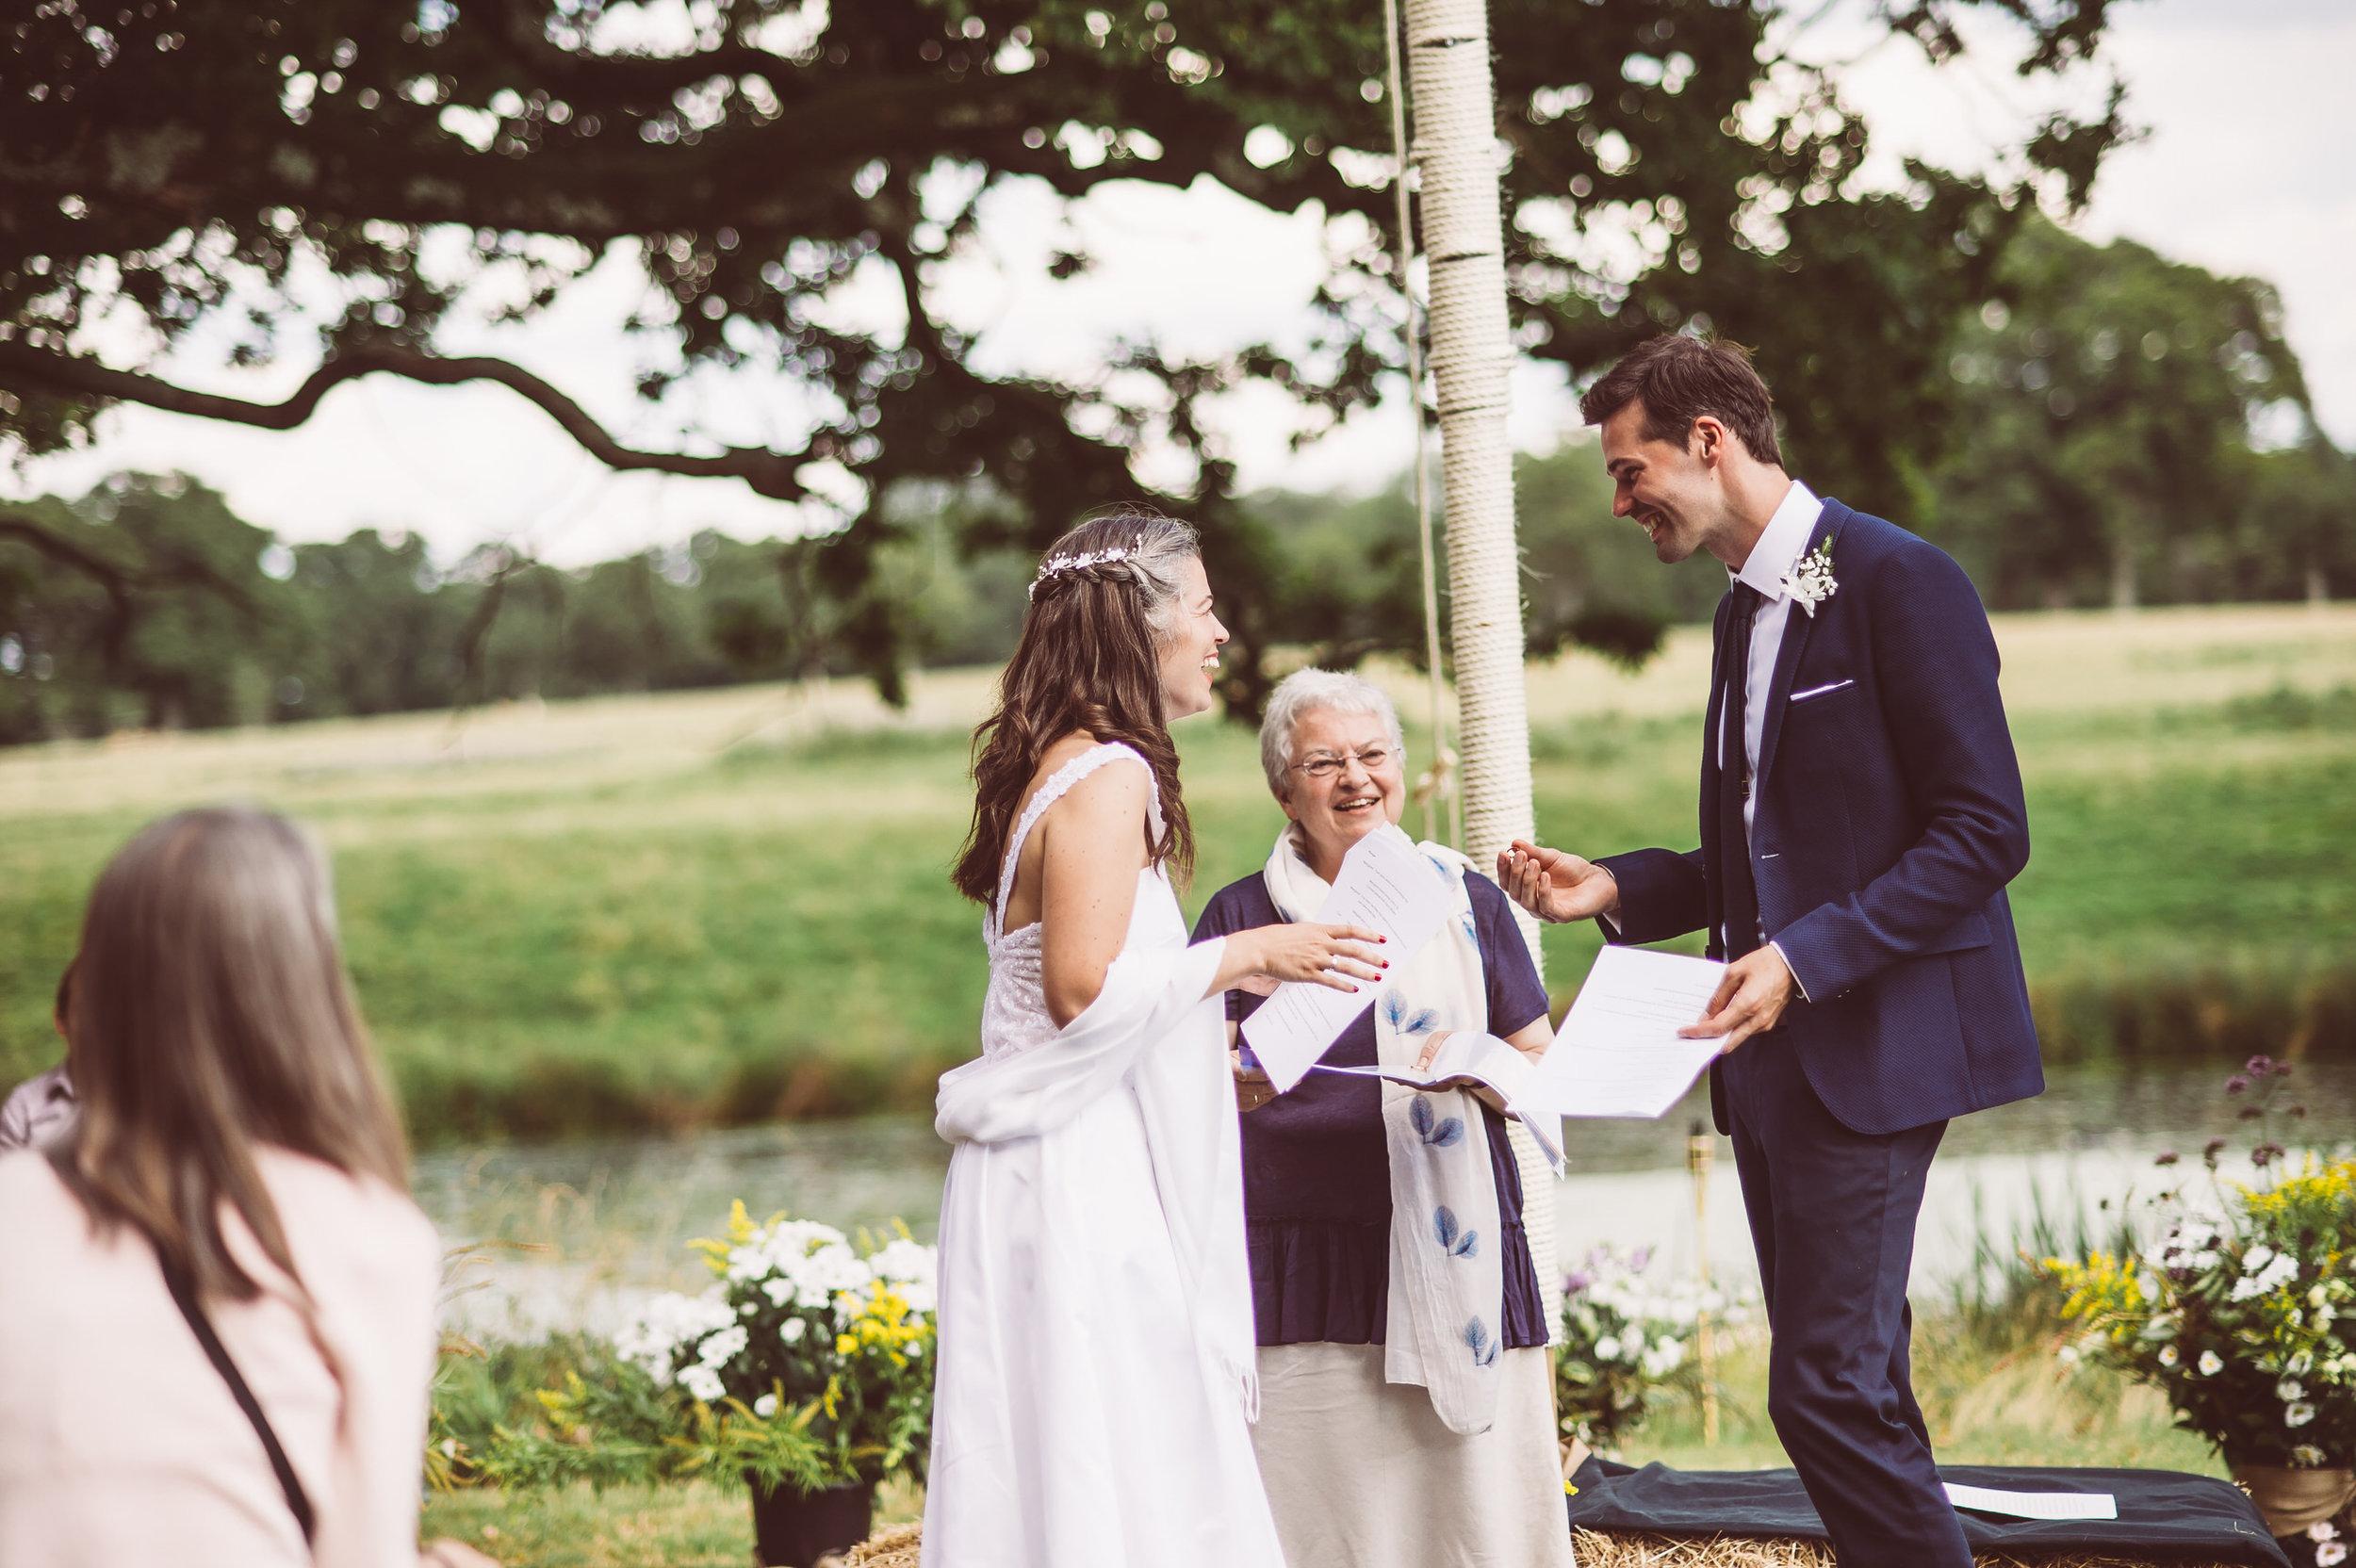 knepp-castle-boho-outdoor-wedding-240.jpg